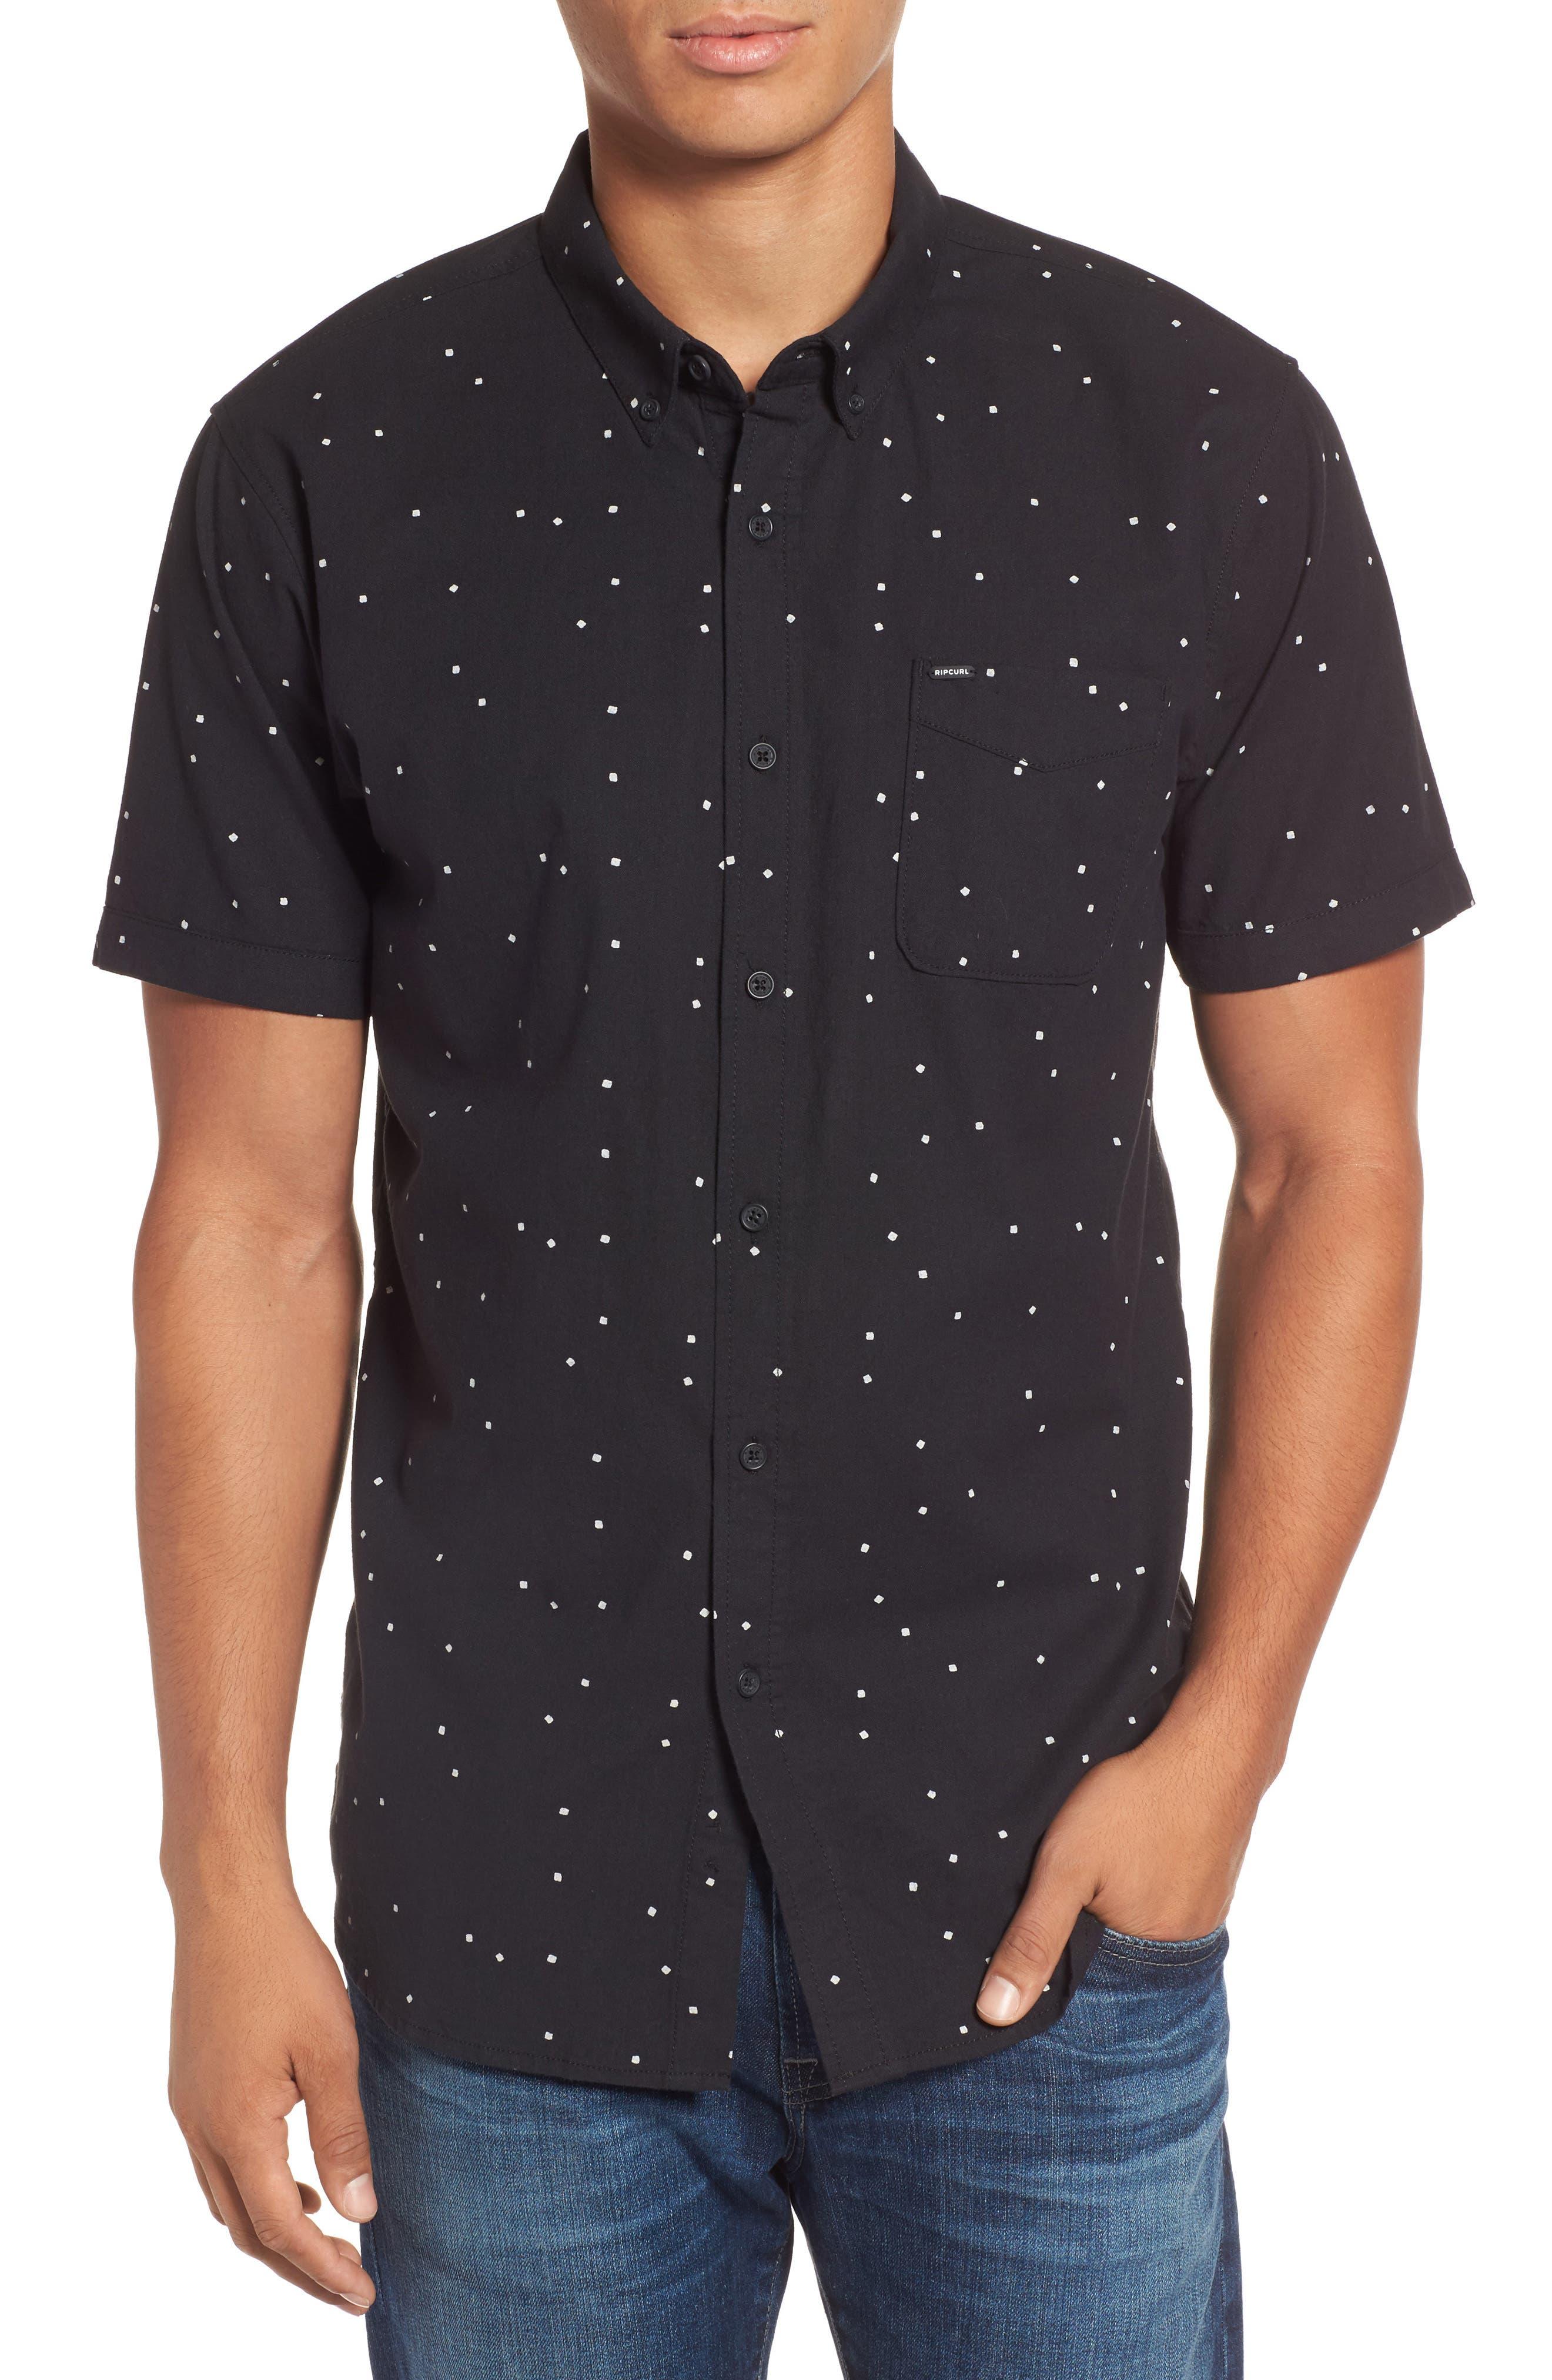 Mixter Short Sleeve Shirt,                         Main,                         color, 001